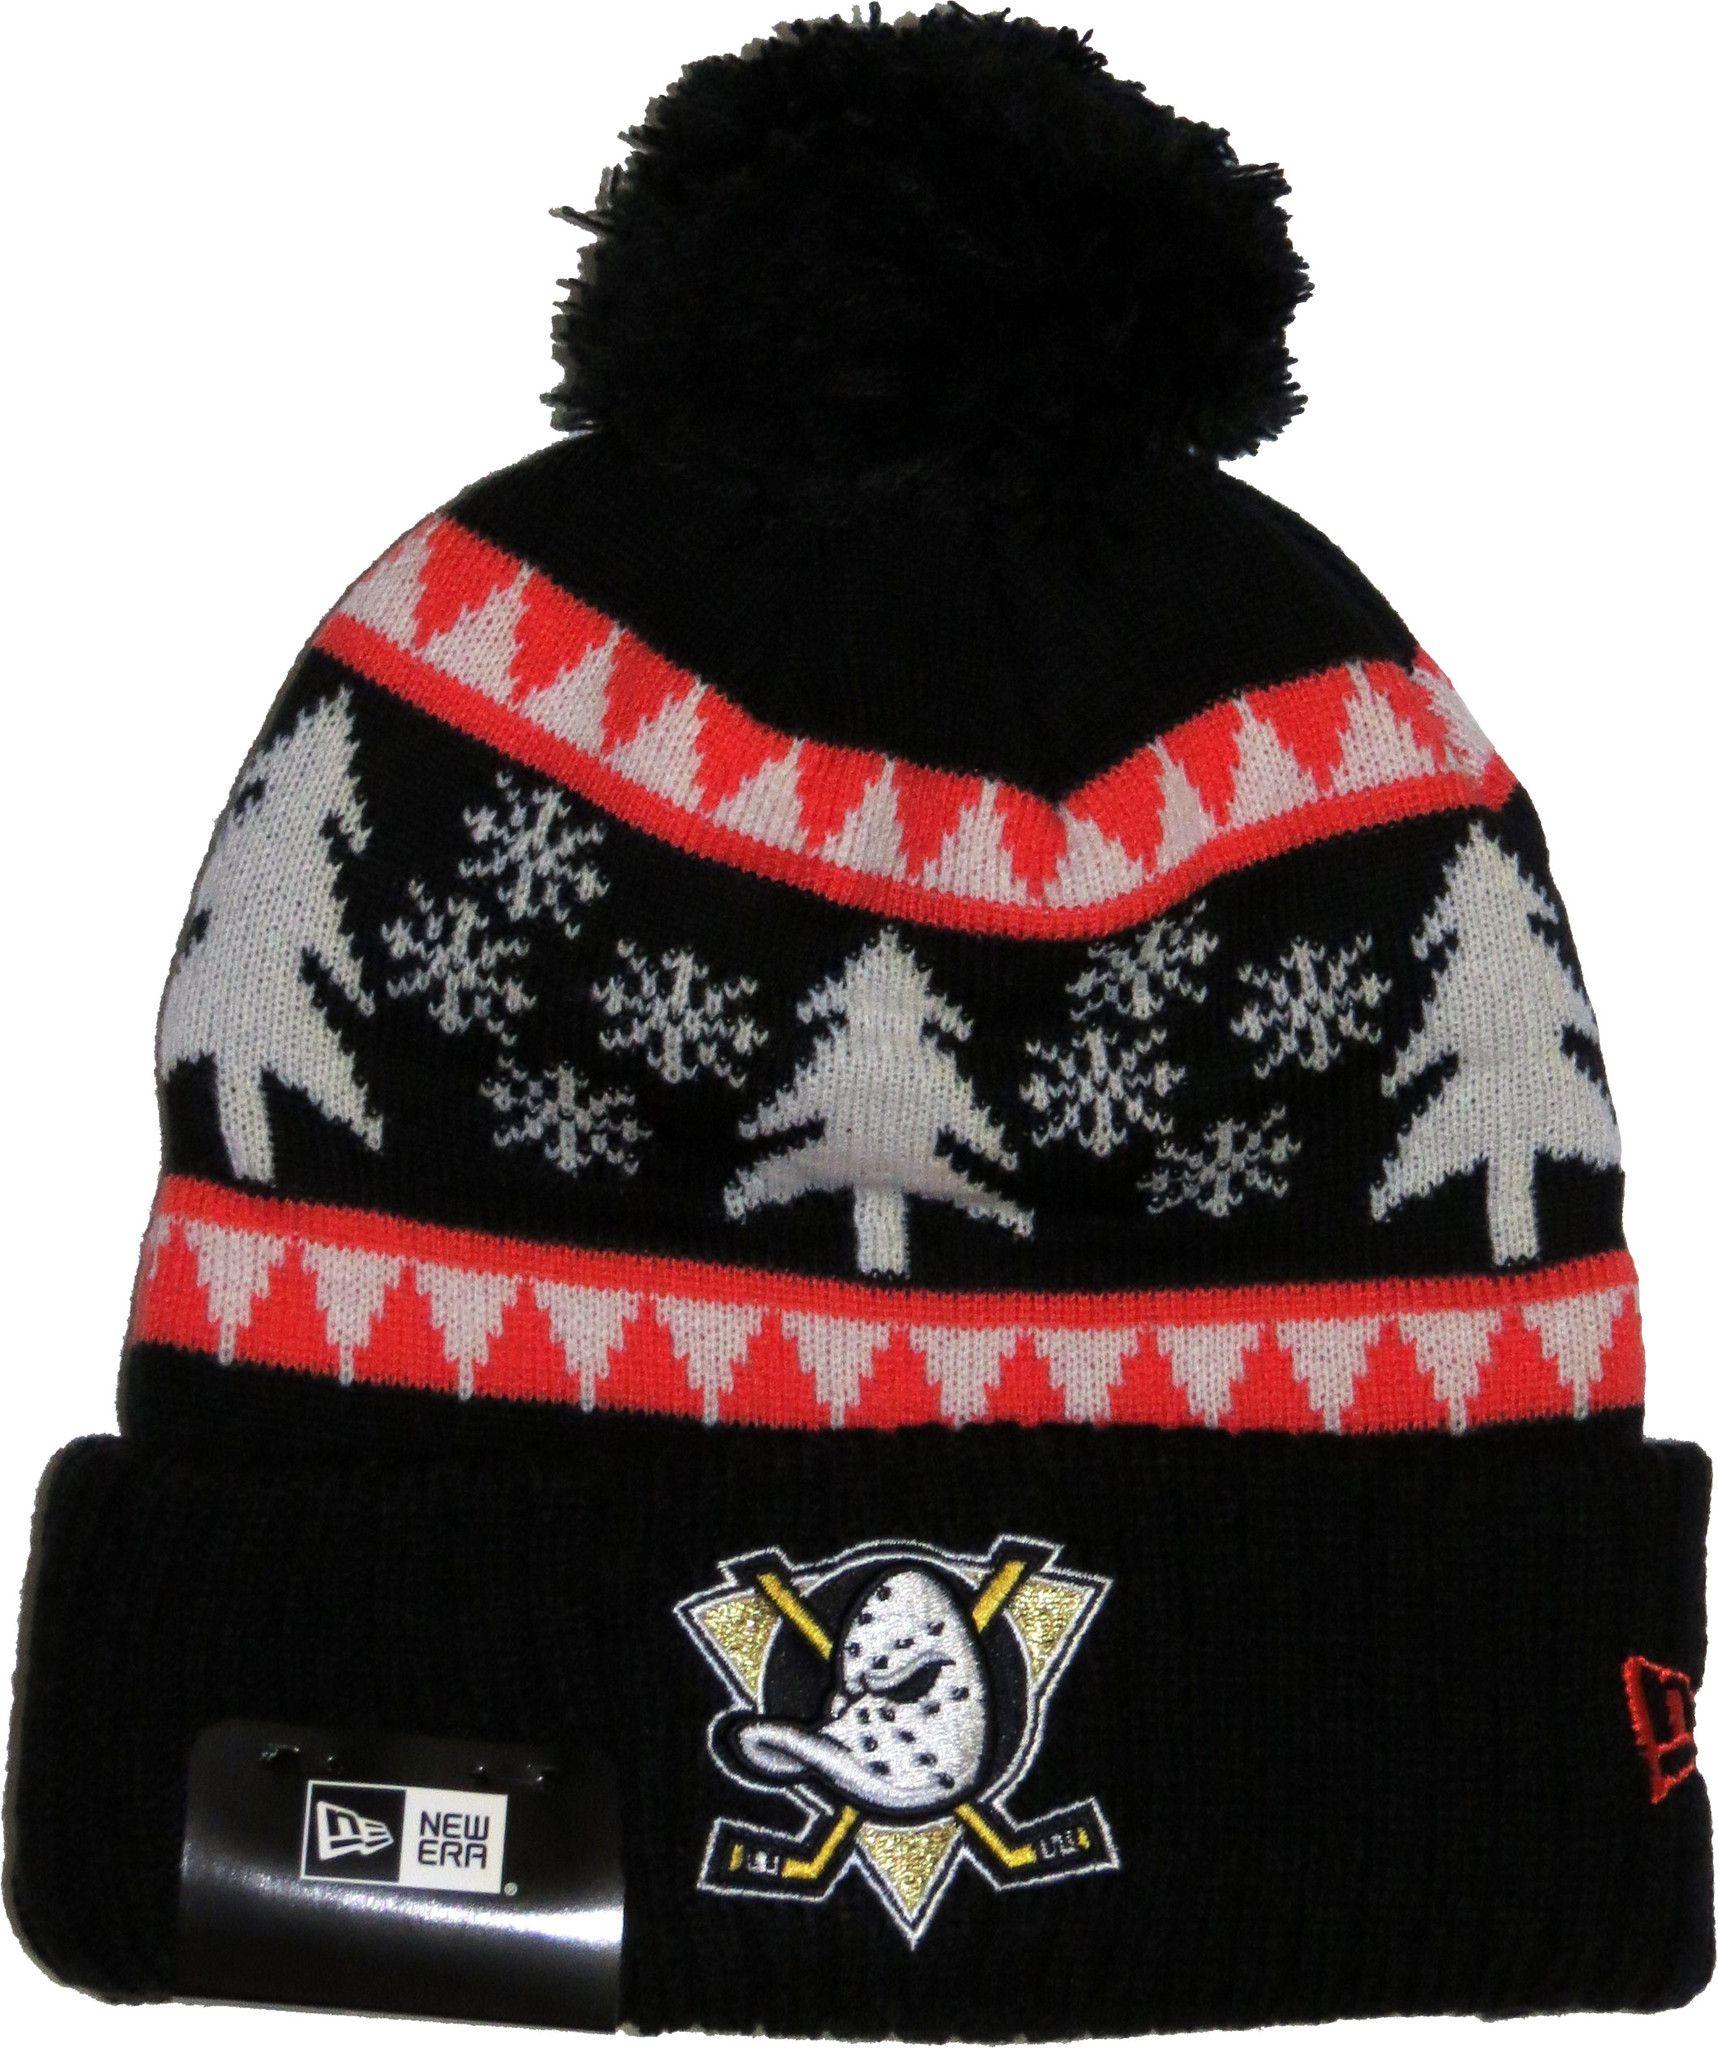 92de3ce4 Anaheim Mighty Ducks New Era NFL Team Snow Pine Bobble Hat   Winter ...